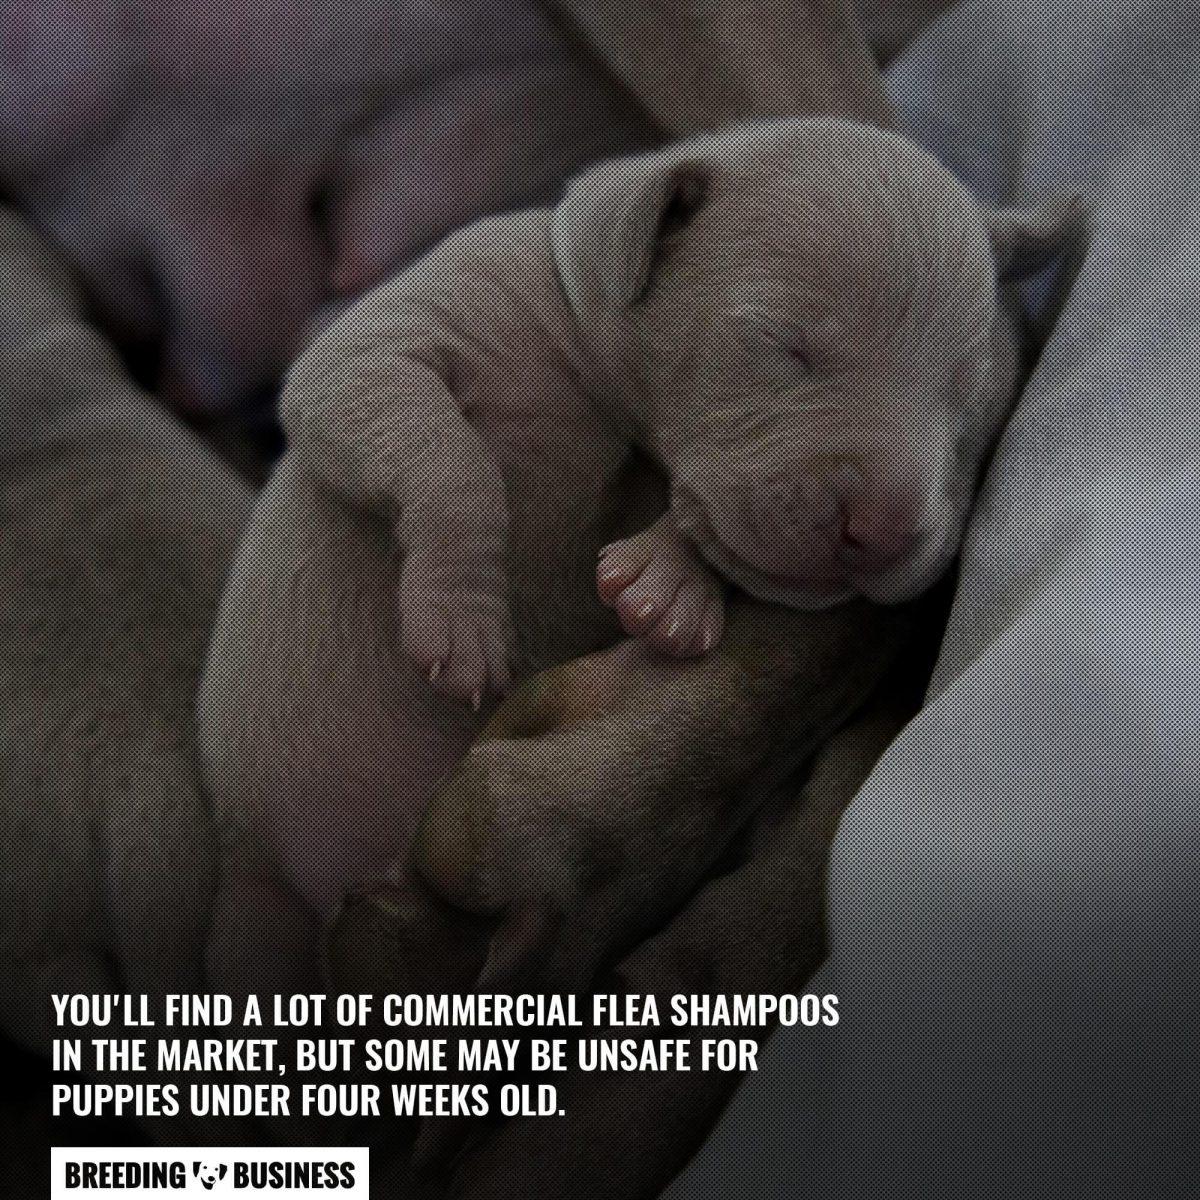 commercial flea shampoos for newborn puppies